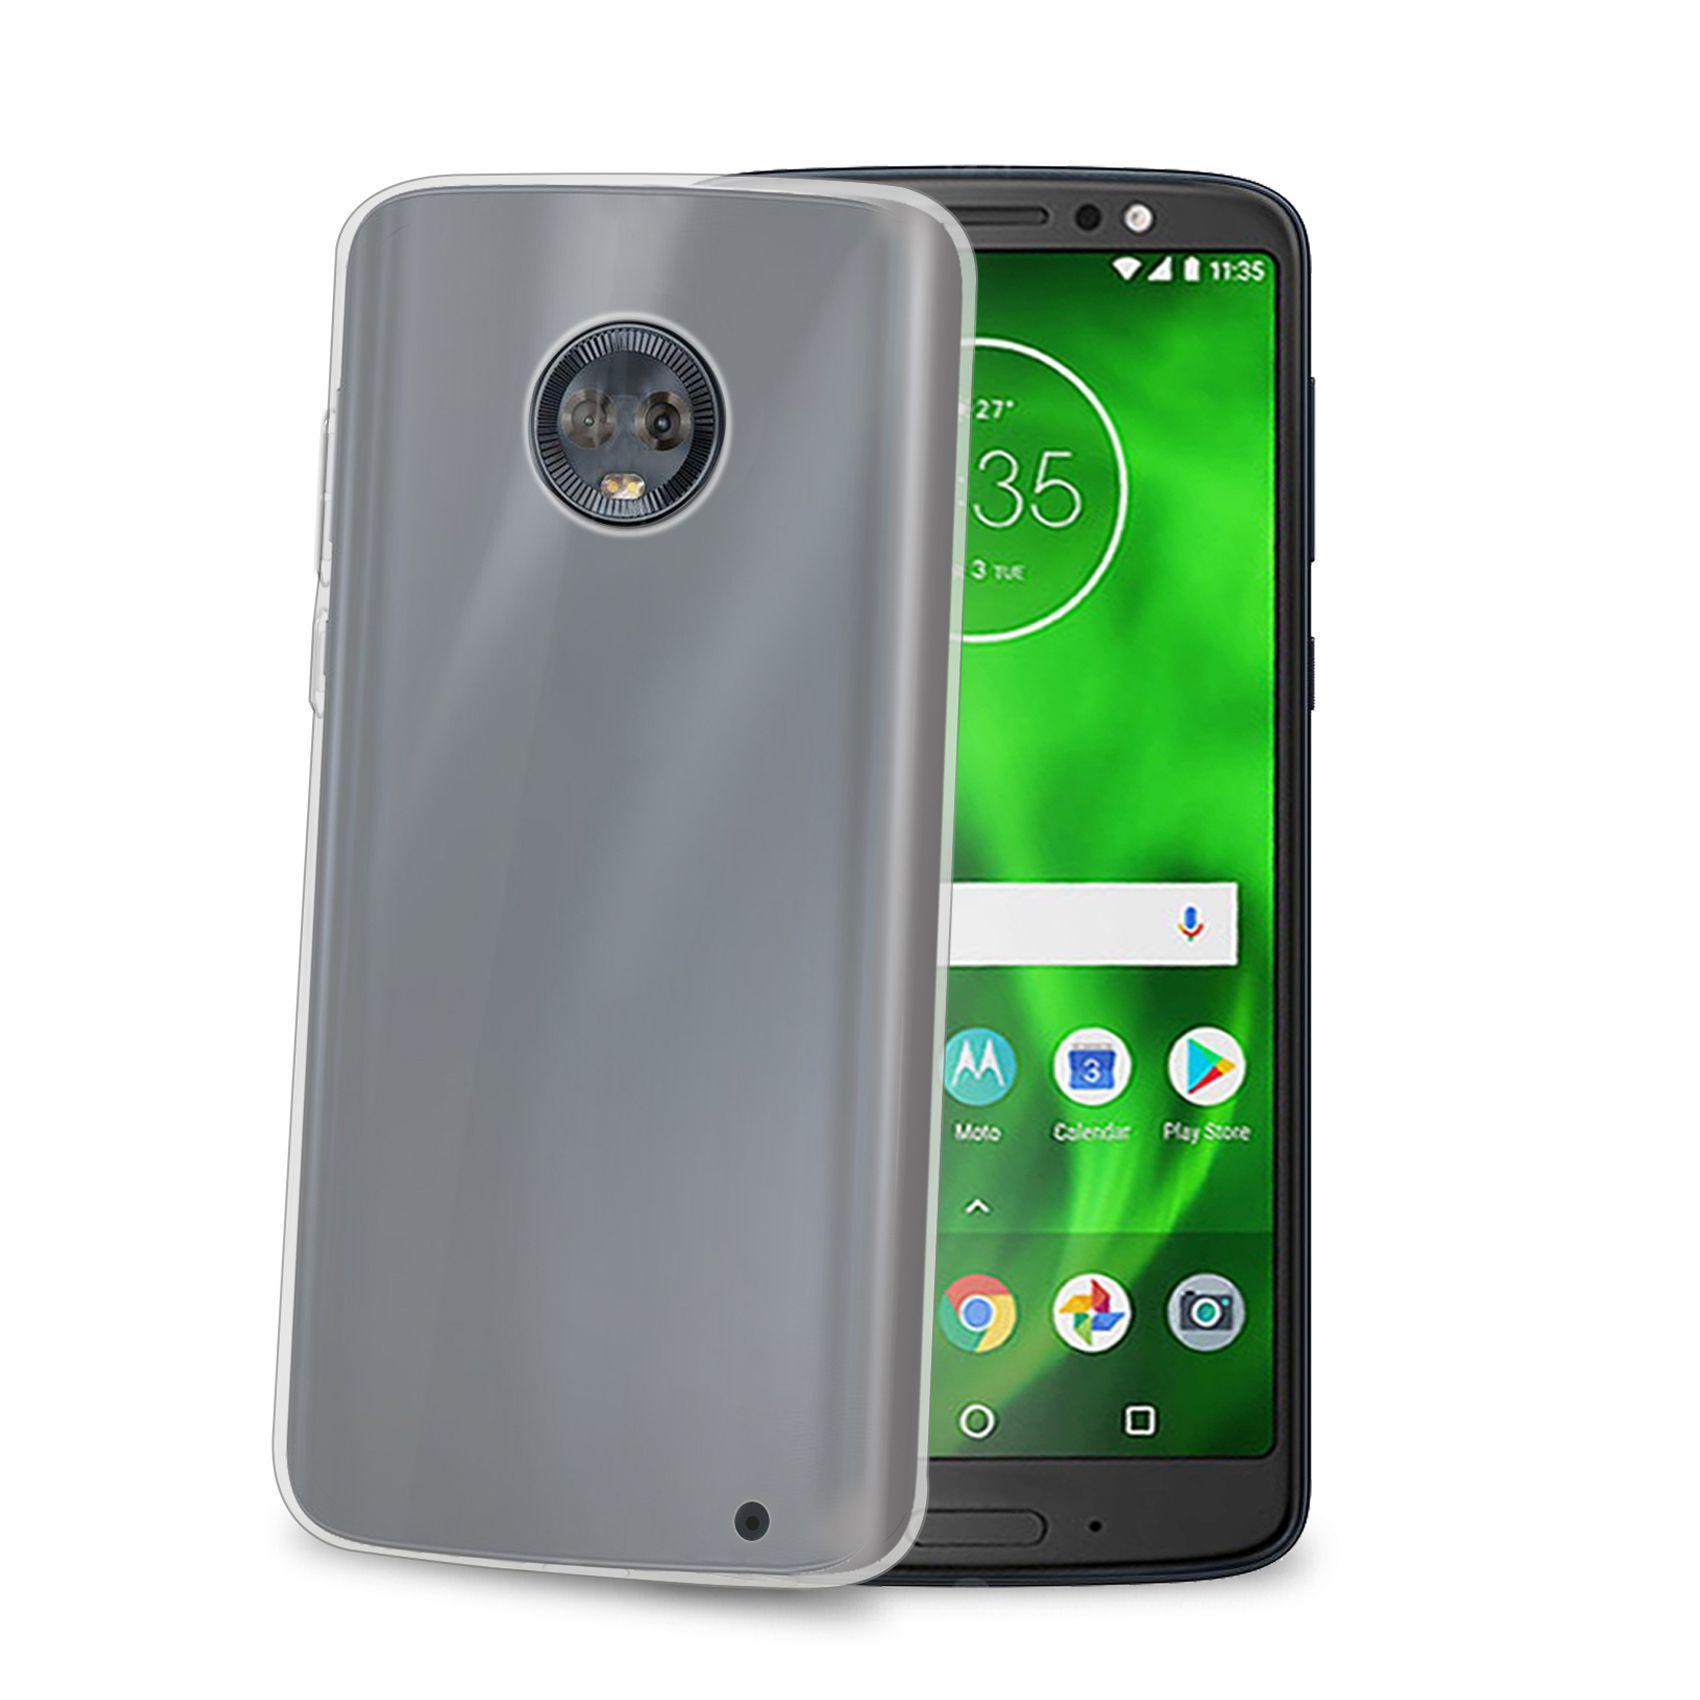 TPU pouzdro CELLY Gelskin pro Motorola Moto G6 Plus, bezbarvé